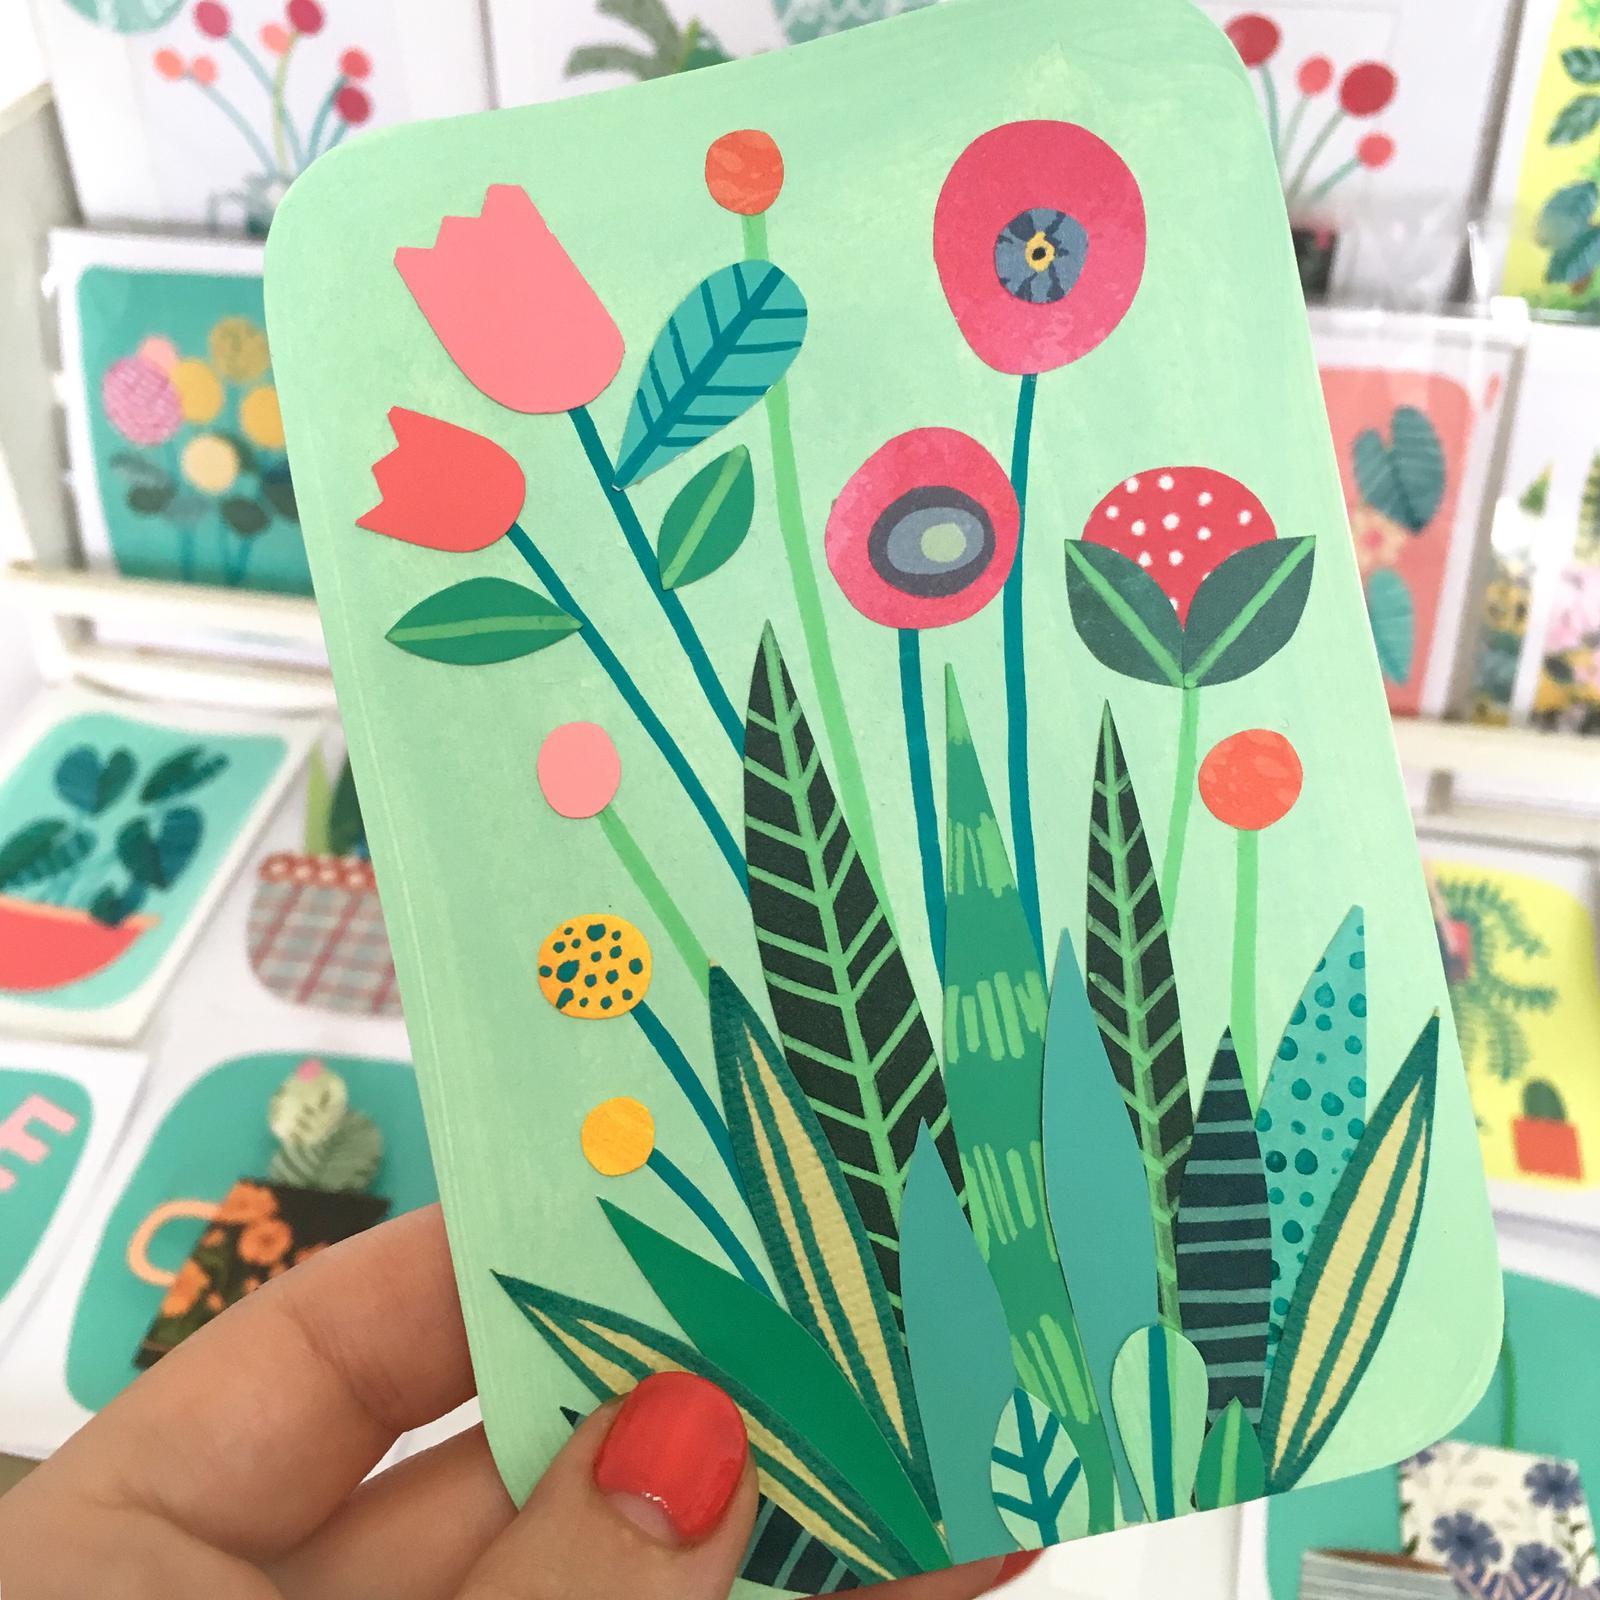 Wildflower Paper Collage